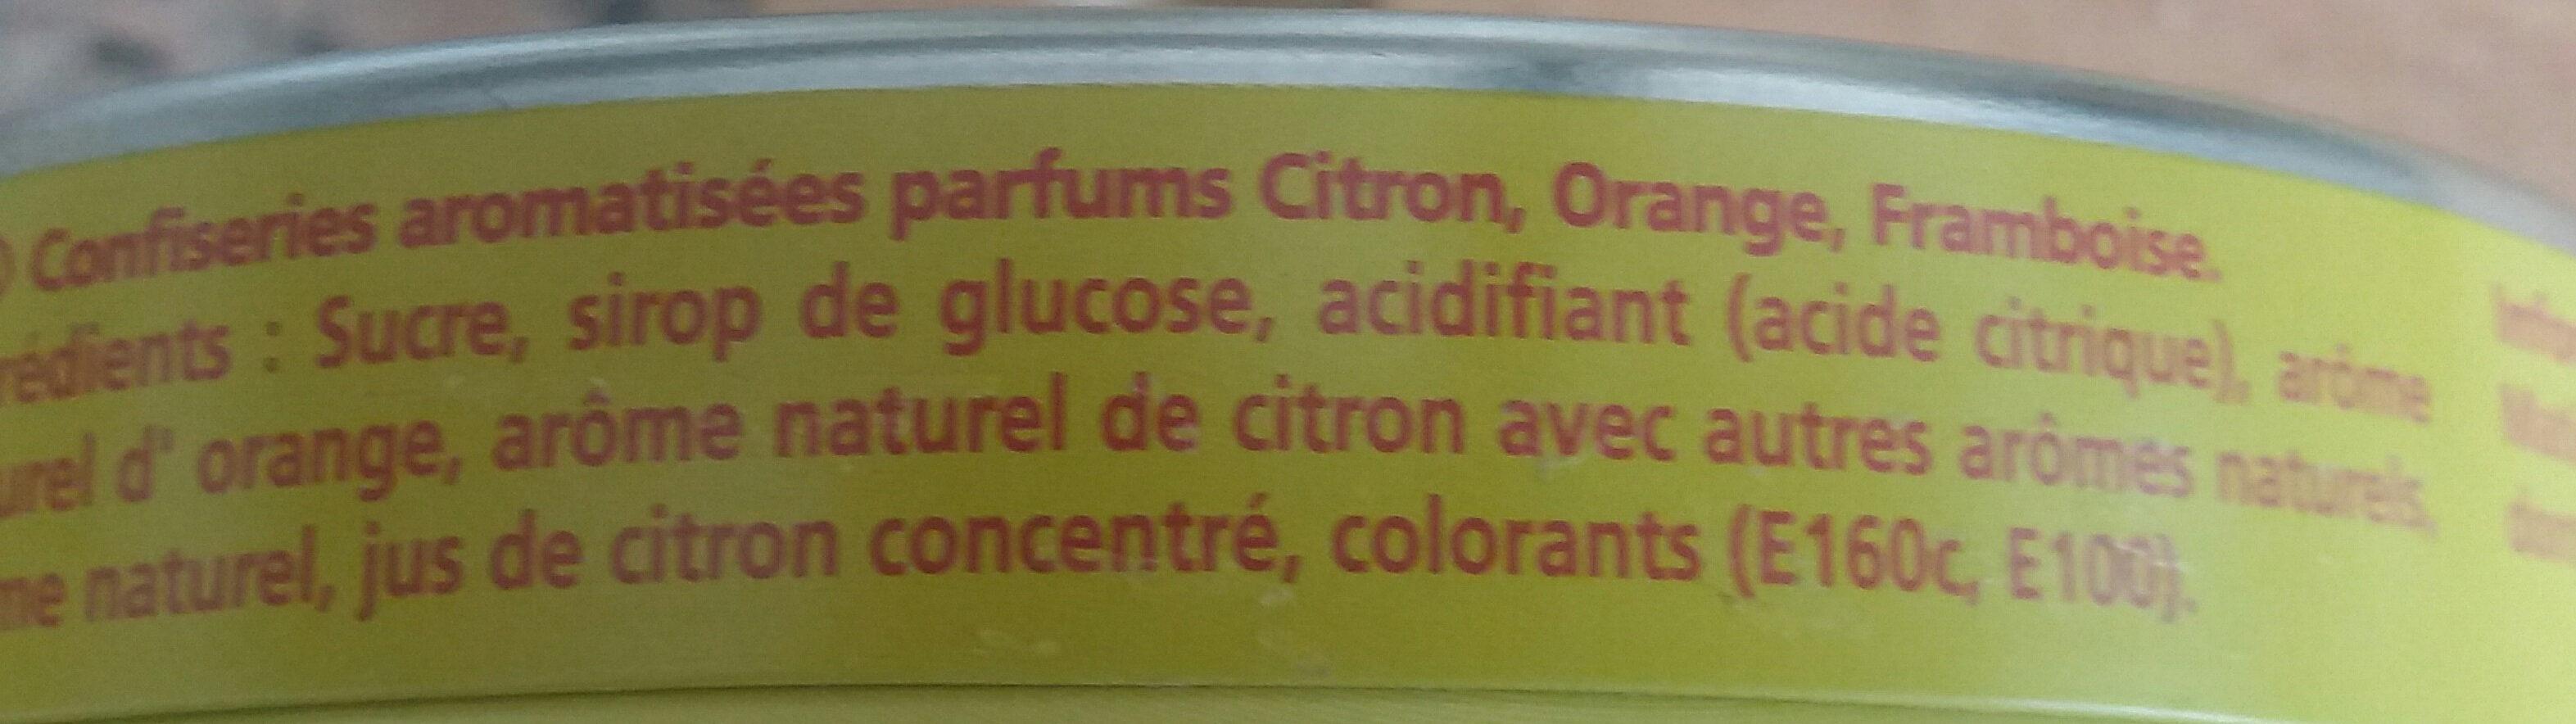 La Vosgienne Parfums Framboise Citron Orange - Ingredients - fr